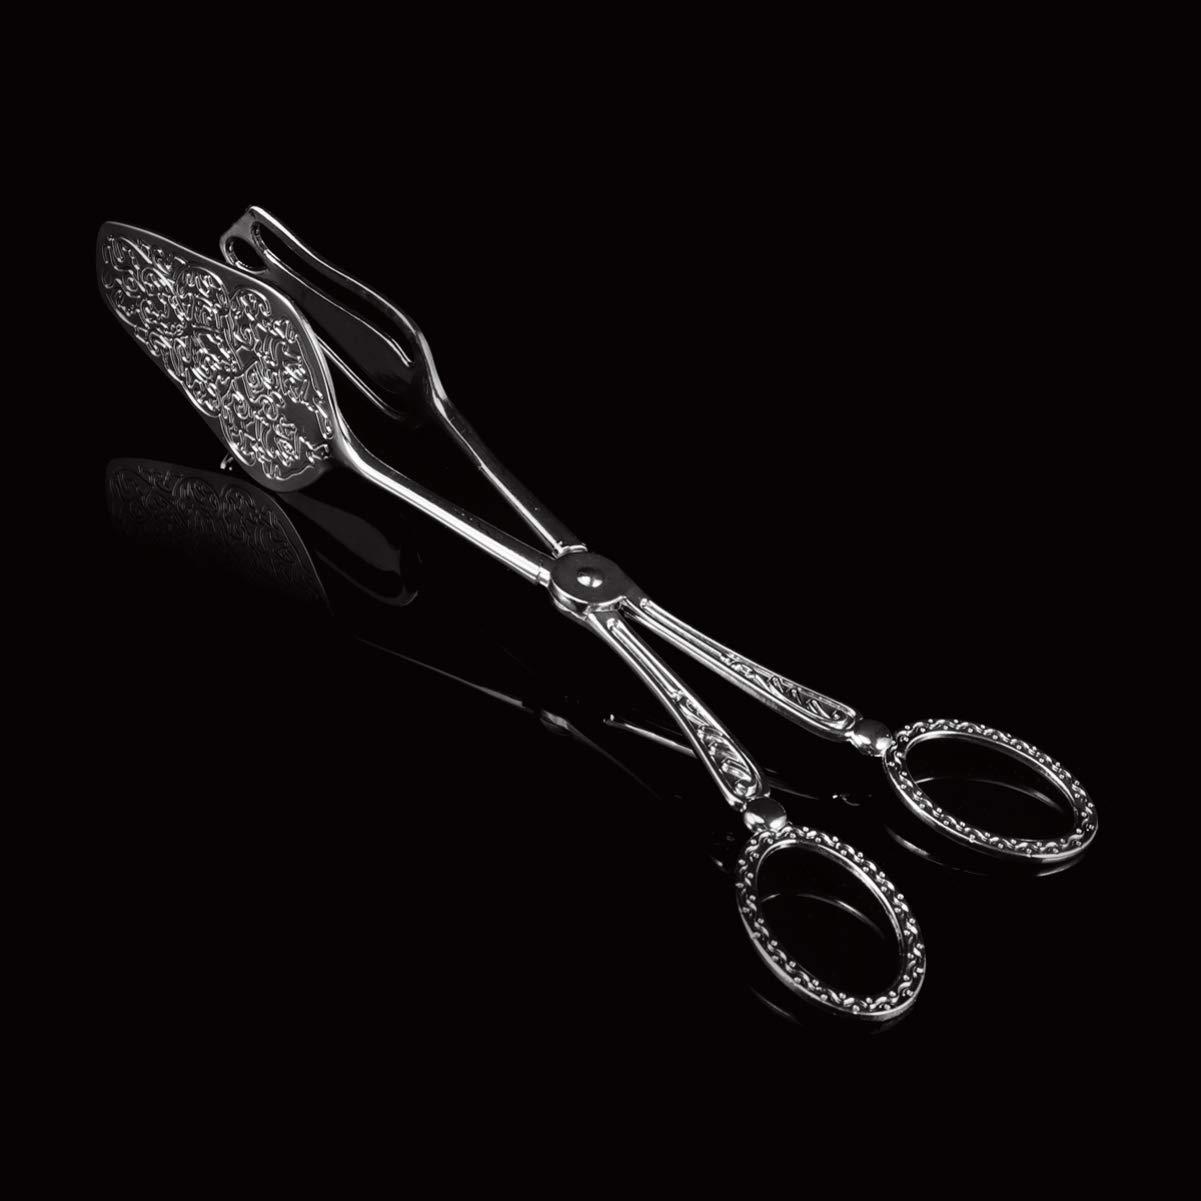 UPKOCH Servierzange K/üchenzange Buffetzange Brotzange Zange zum Kochen Grillen Servieren Kuppelkopf Cuspidal Head M 1